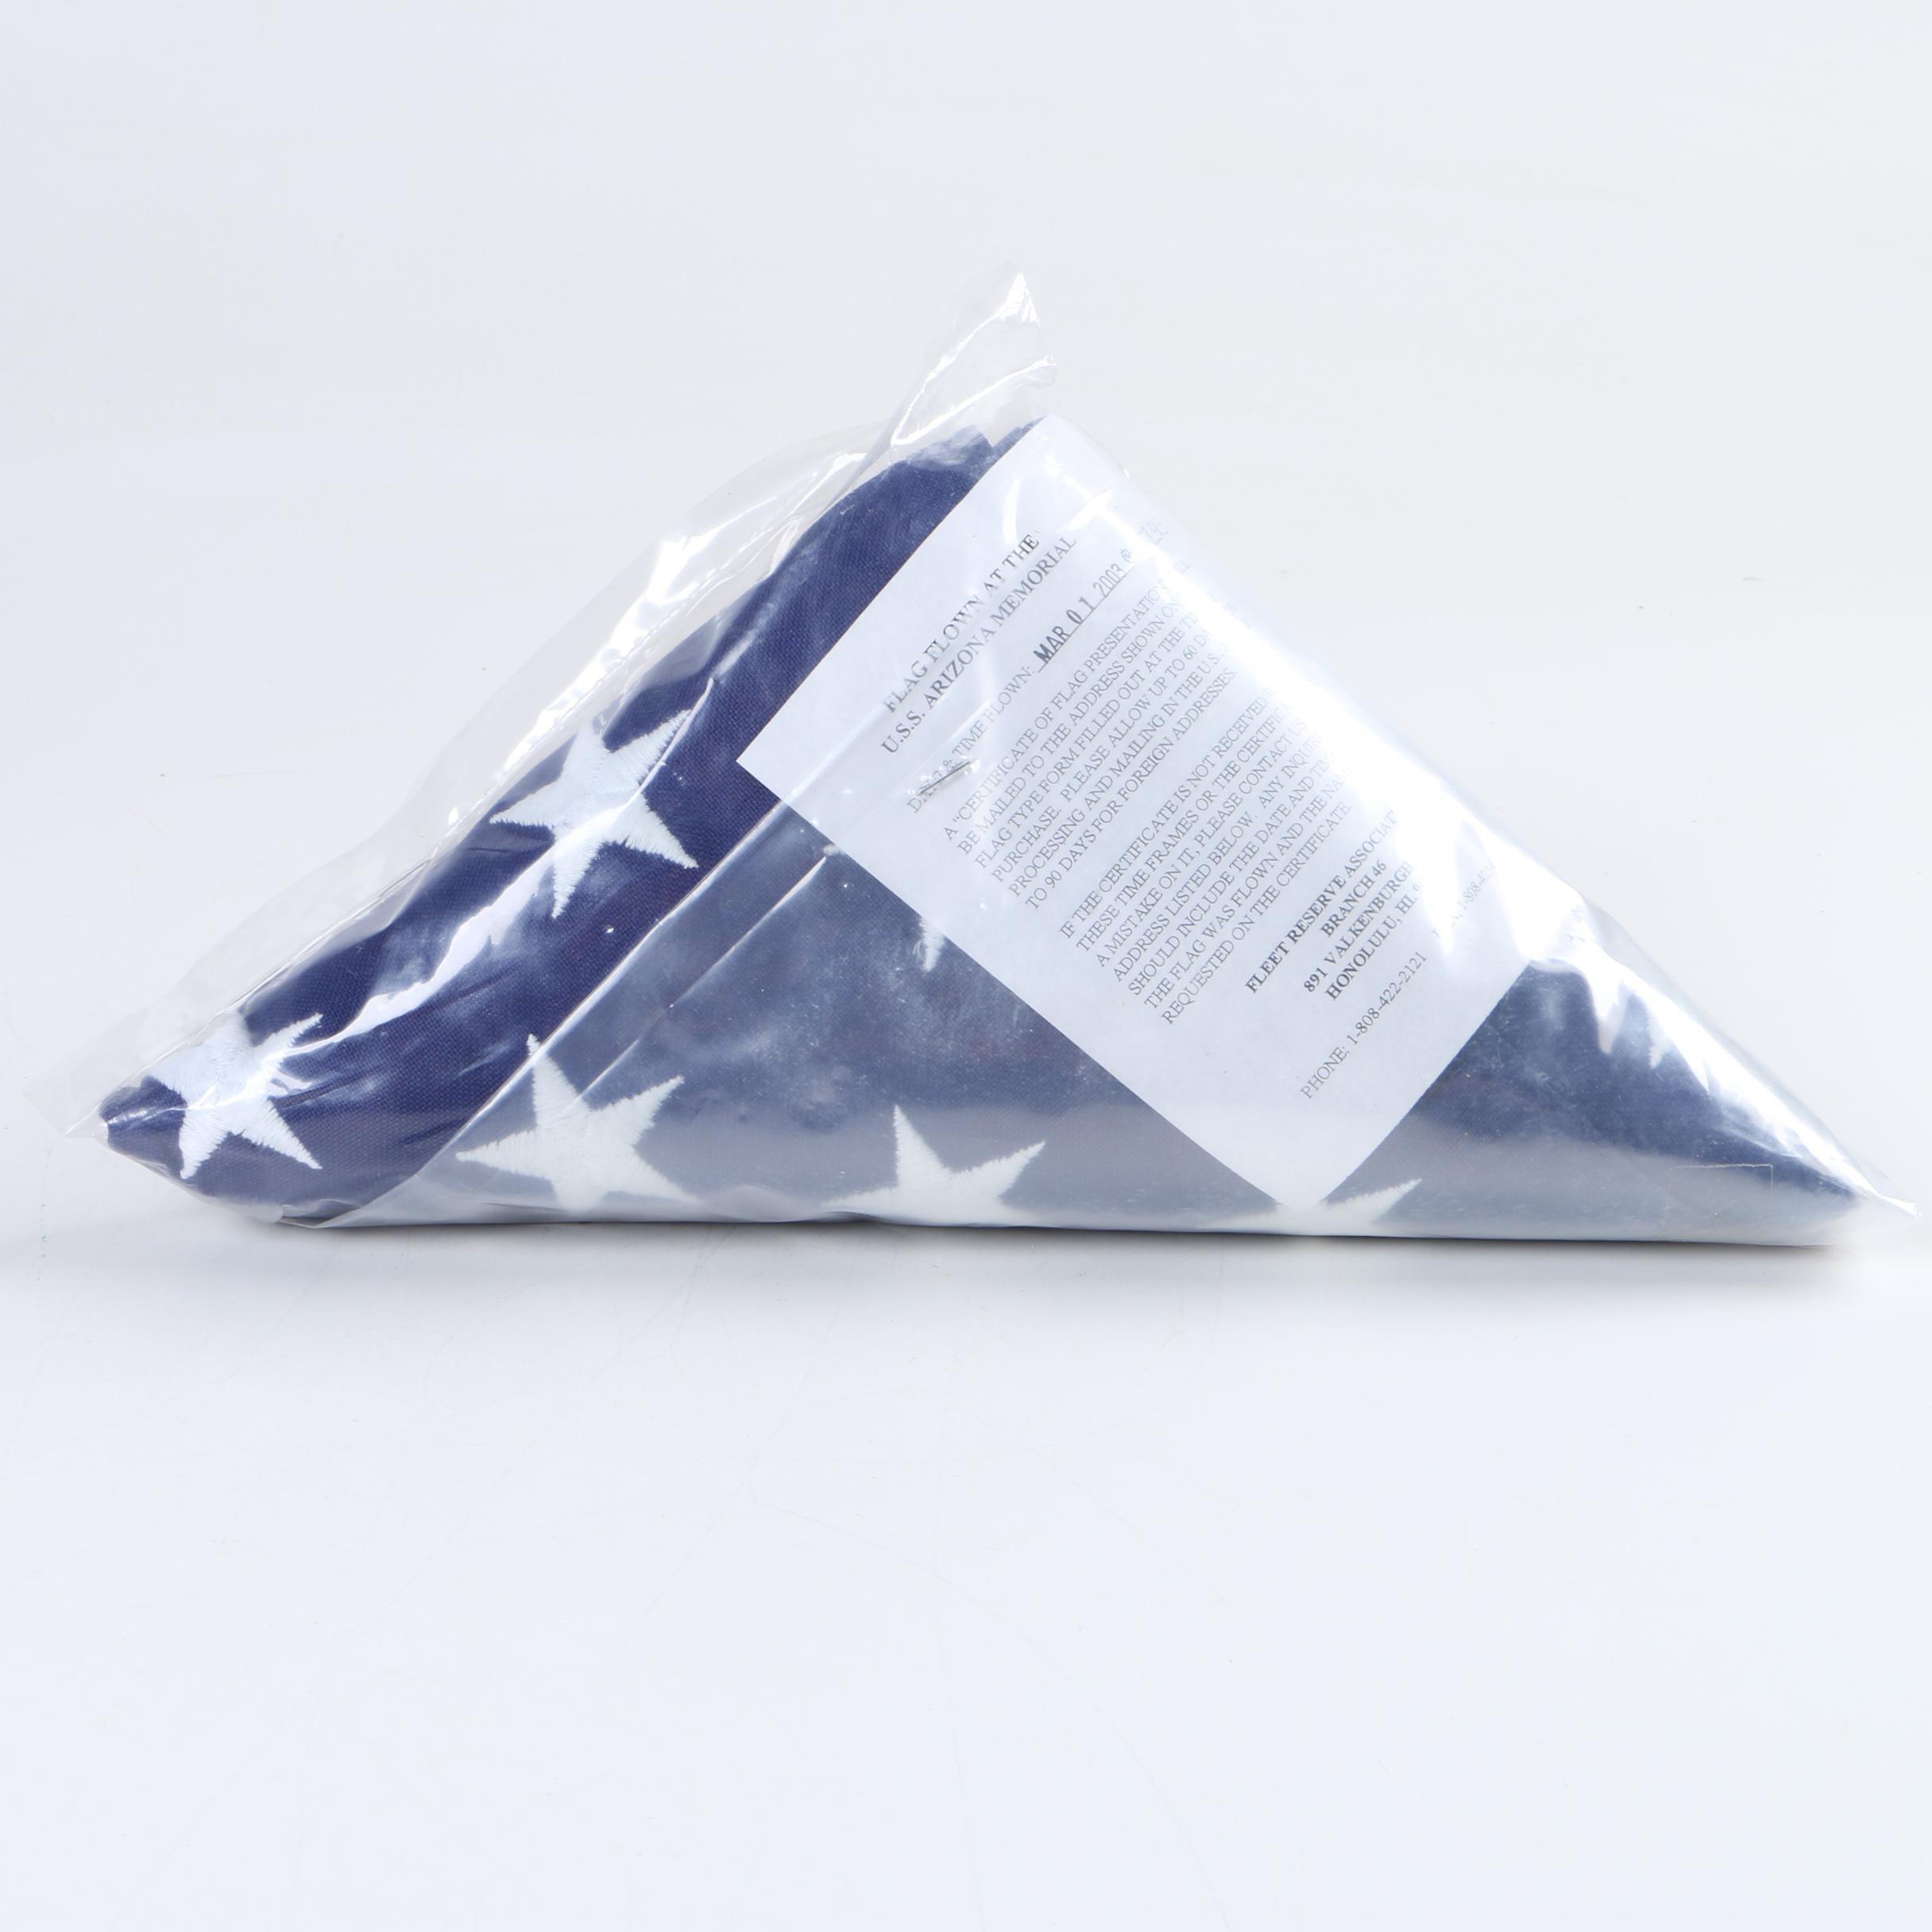 United States Flag Flown at the U.S.S. Arizona Memorial